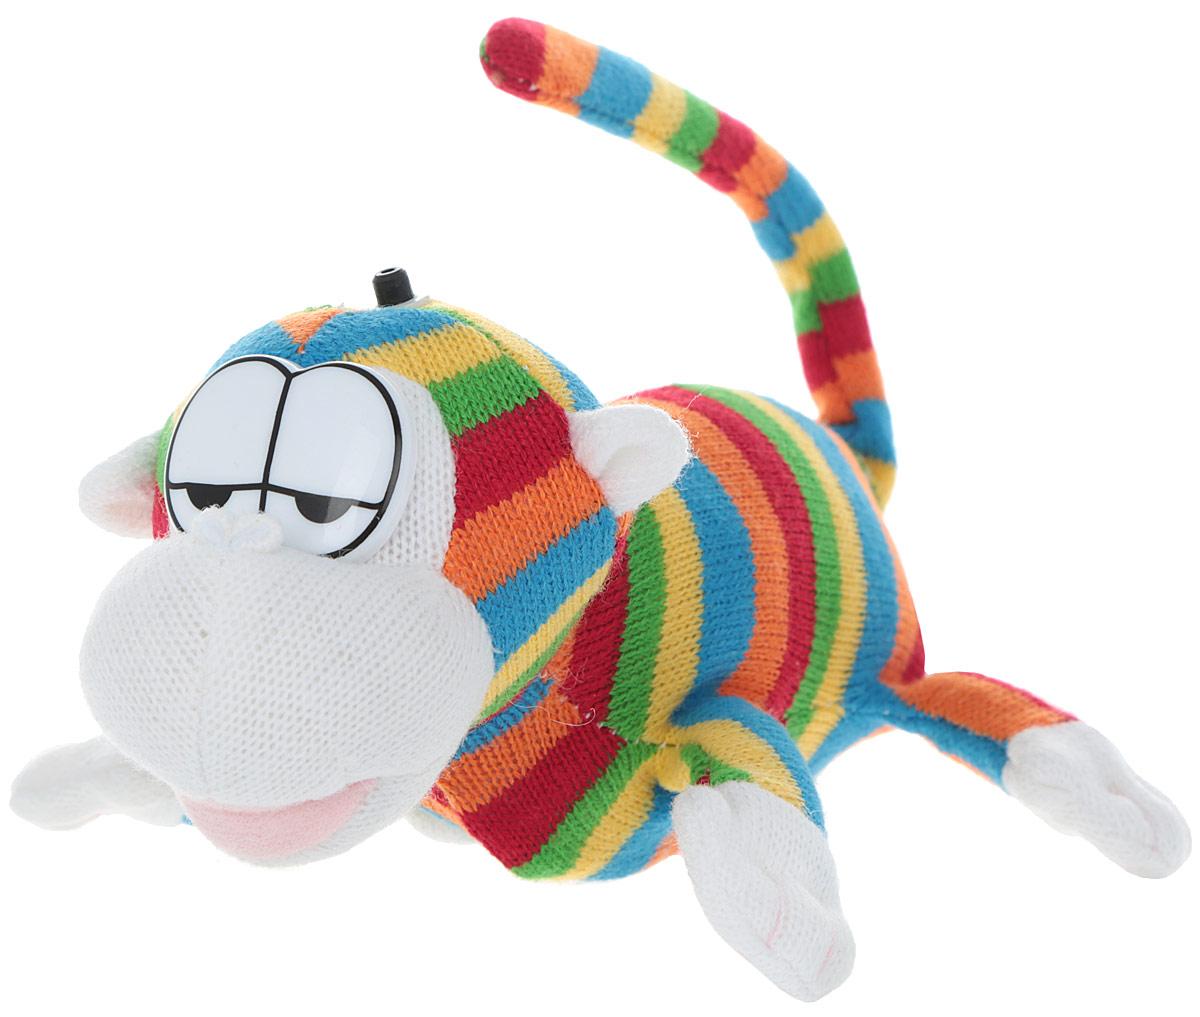 Chericole Интерактивная мягкая игрушка Обезьянка CTC-SM-9818C